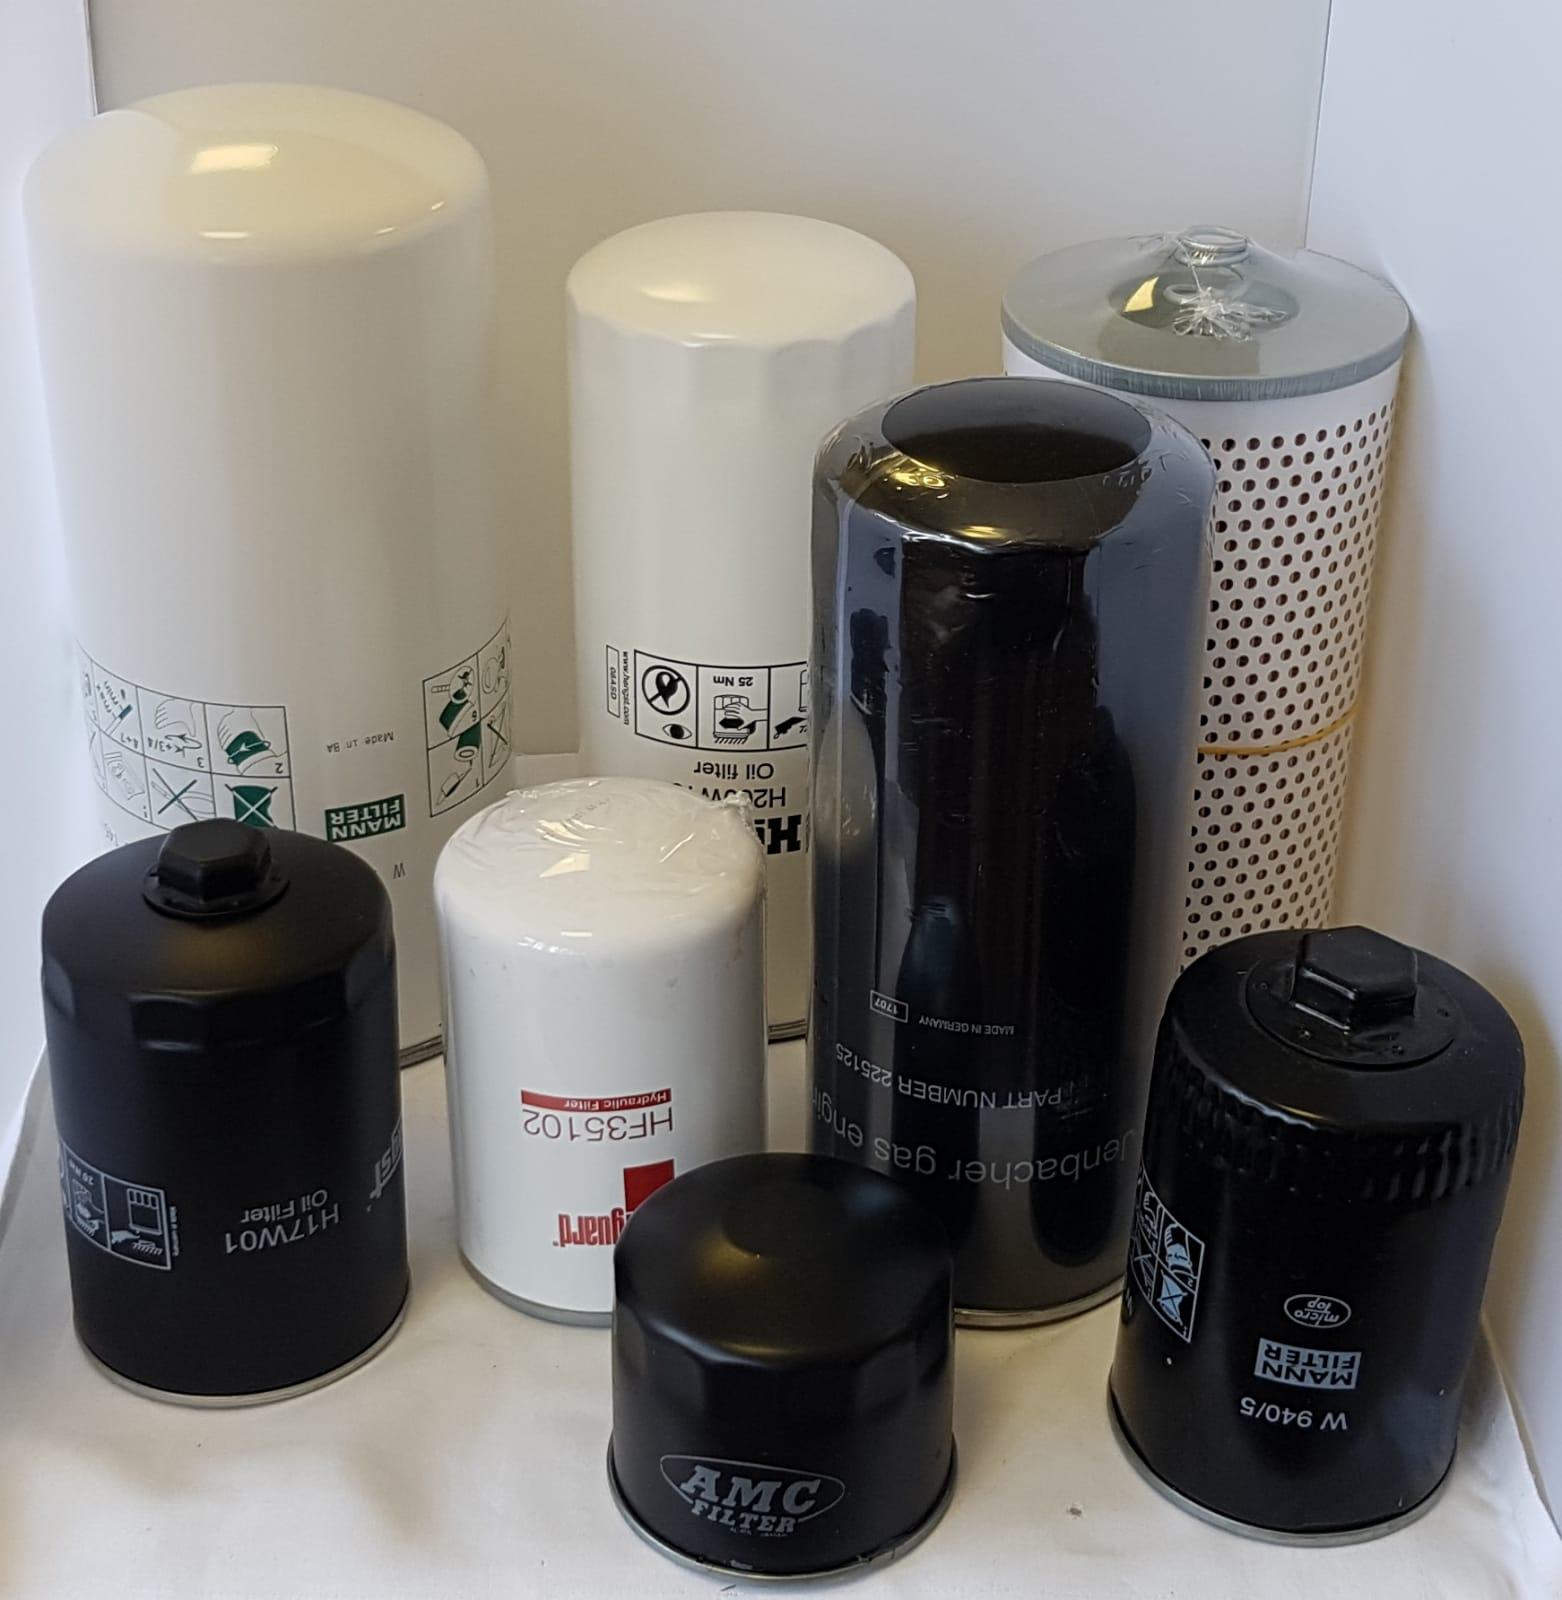 Oliefilters voor gasmotoren